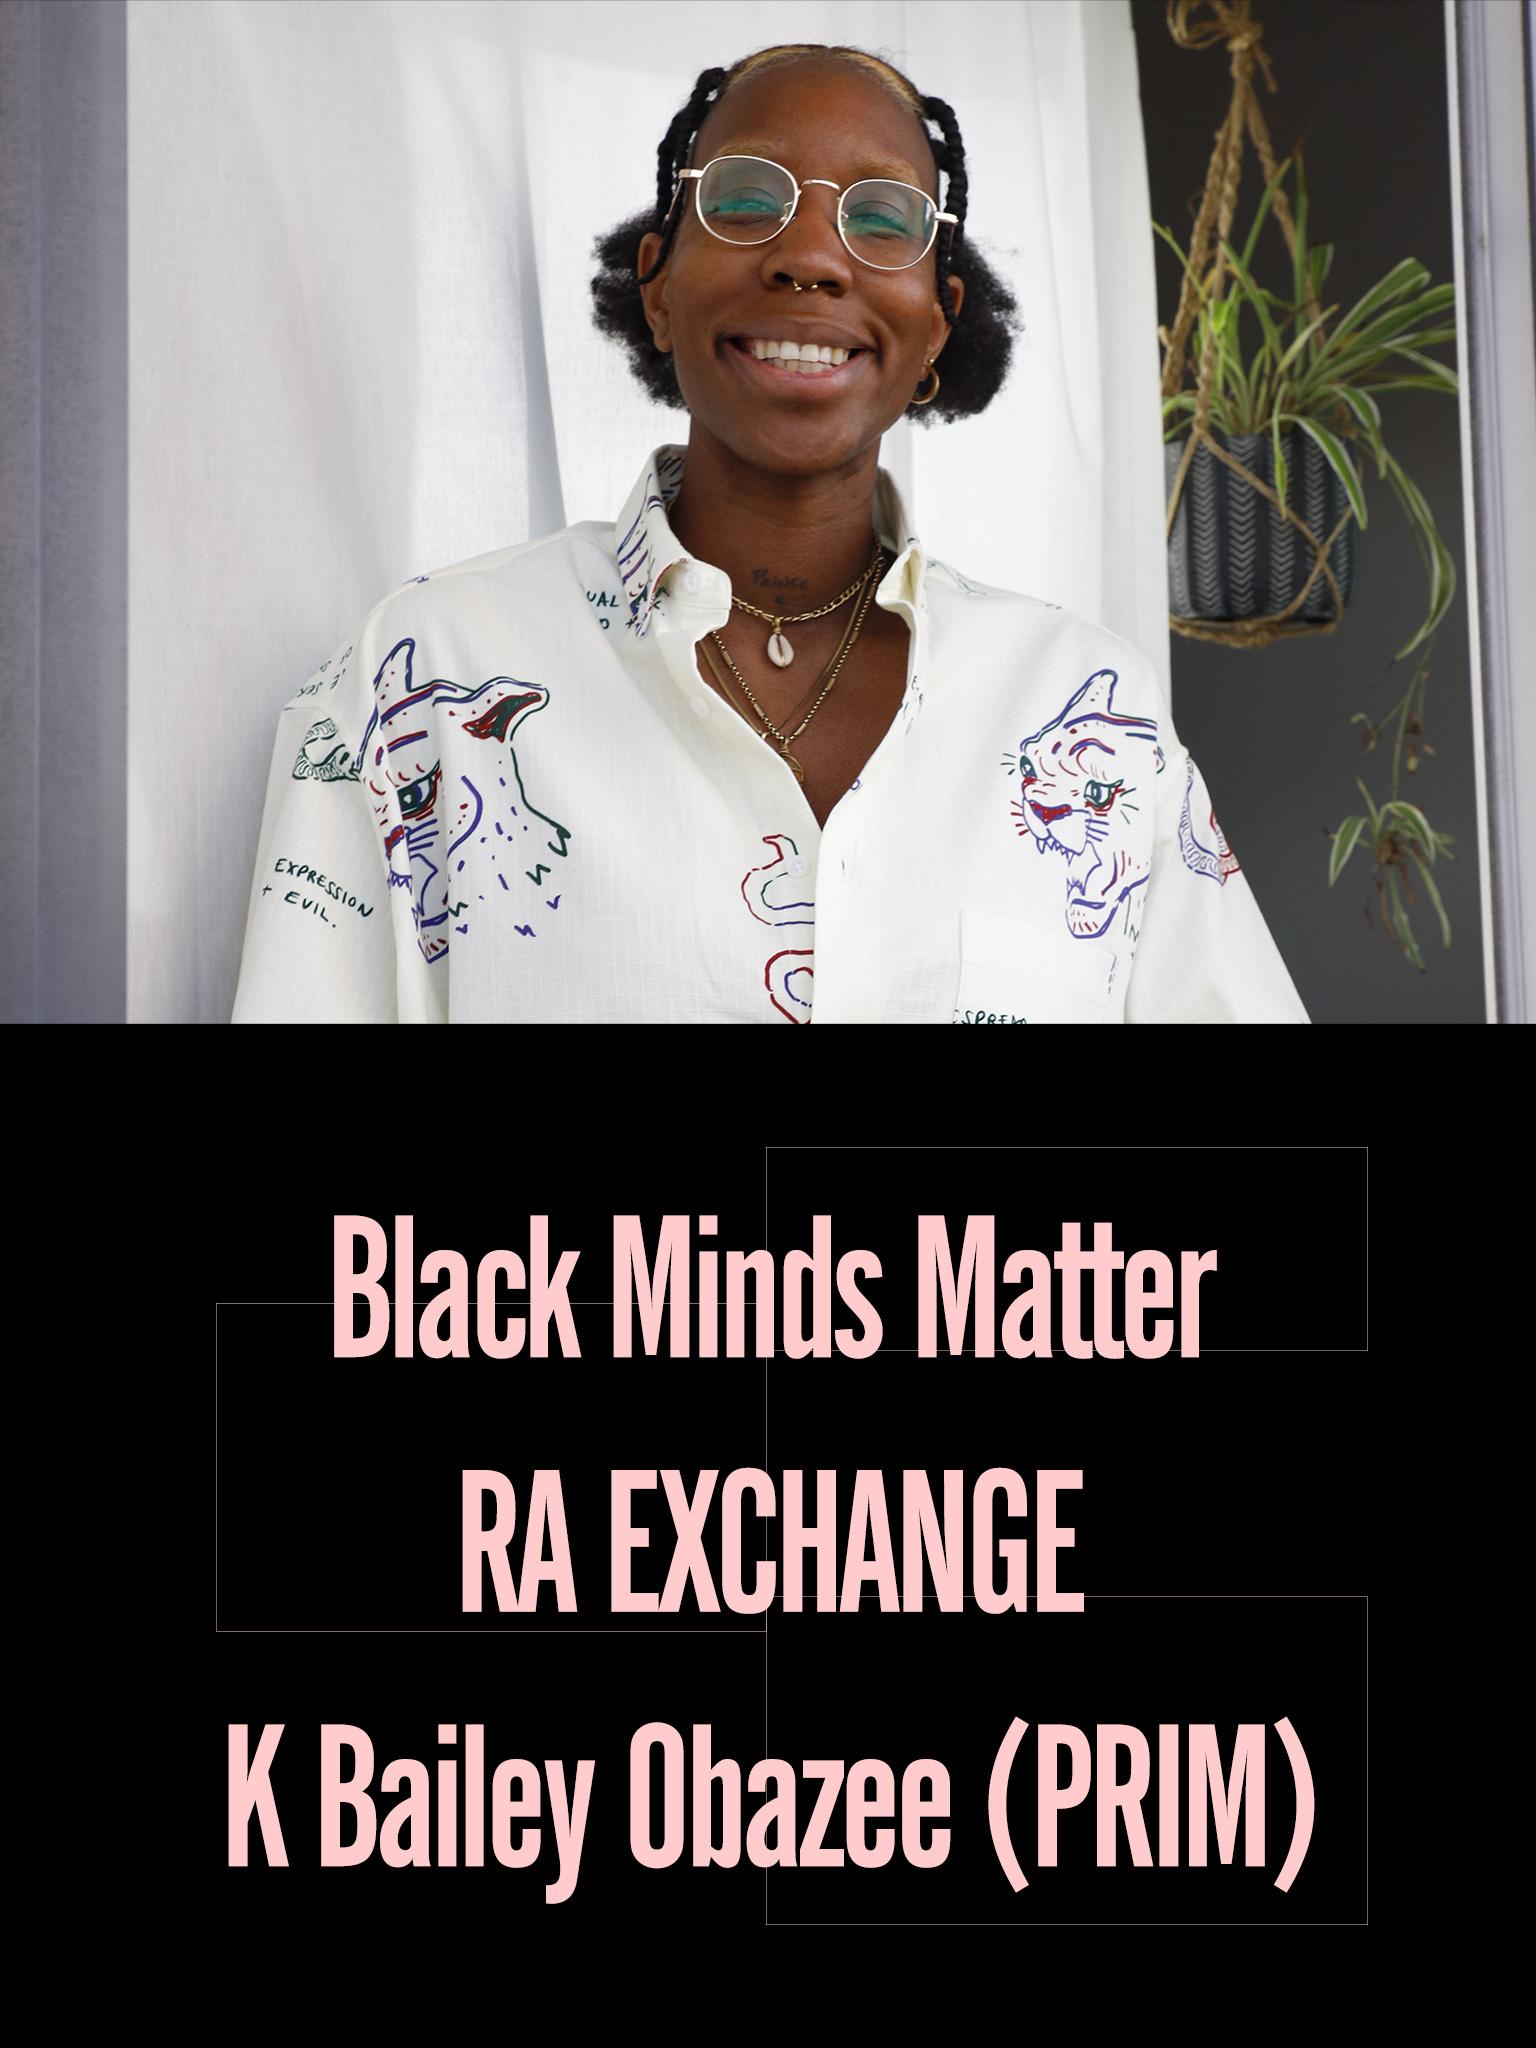 Black Minds Matter UK x RA Exchange: K Bailey Obazee (PRIM)